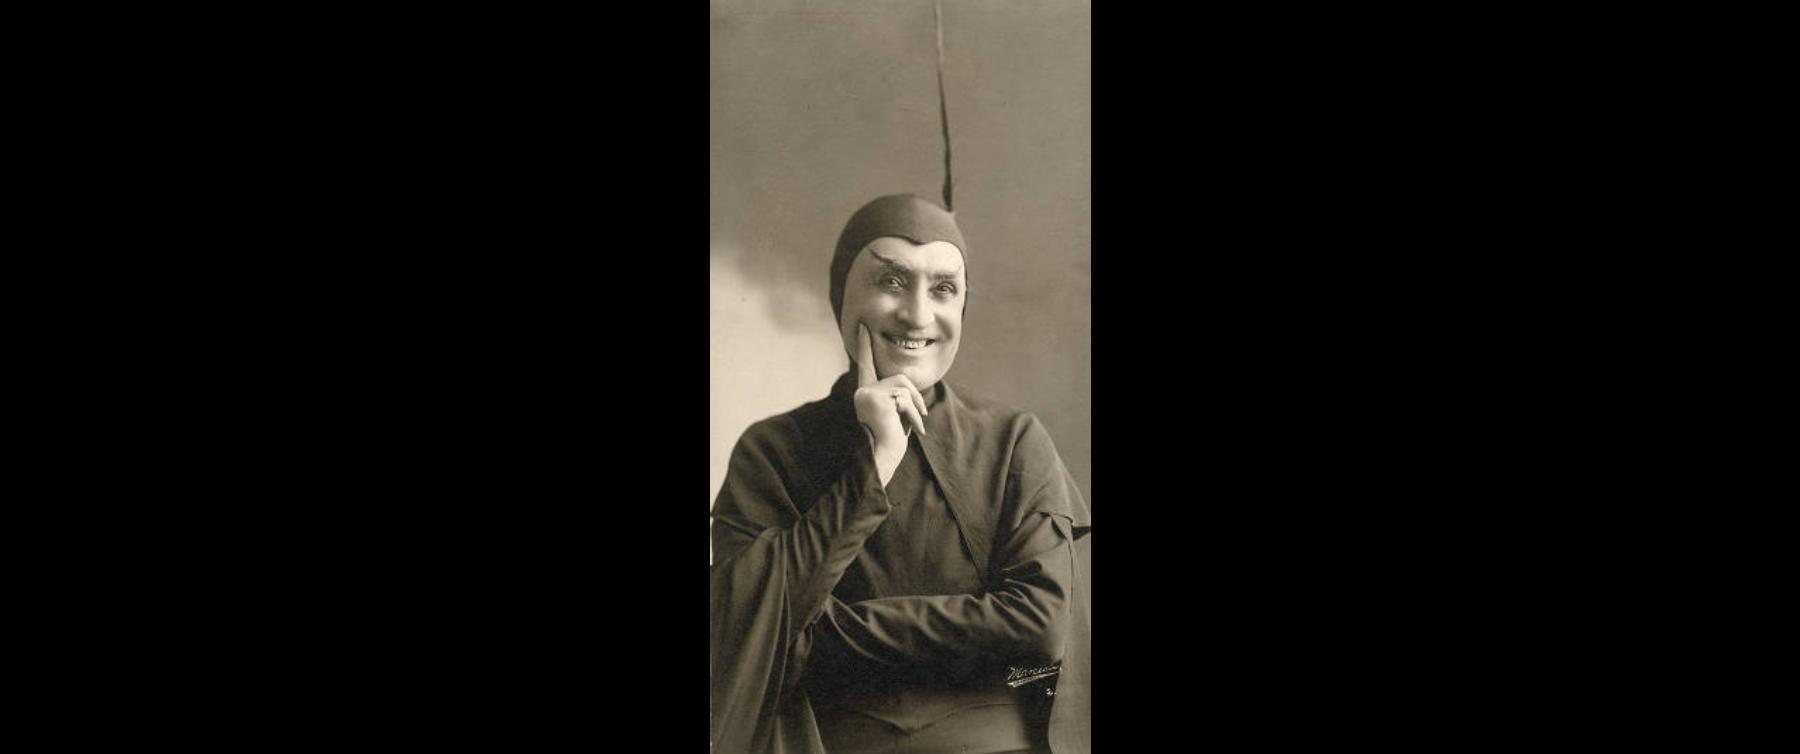 Lewis Morrison as Mephistopheles in Goethe's Faust (1905)